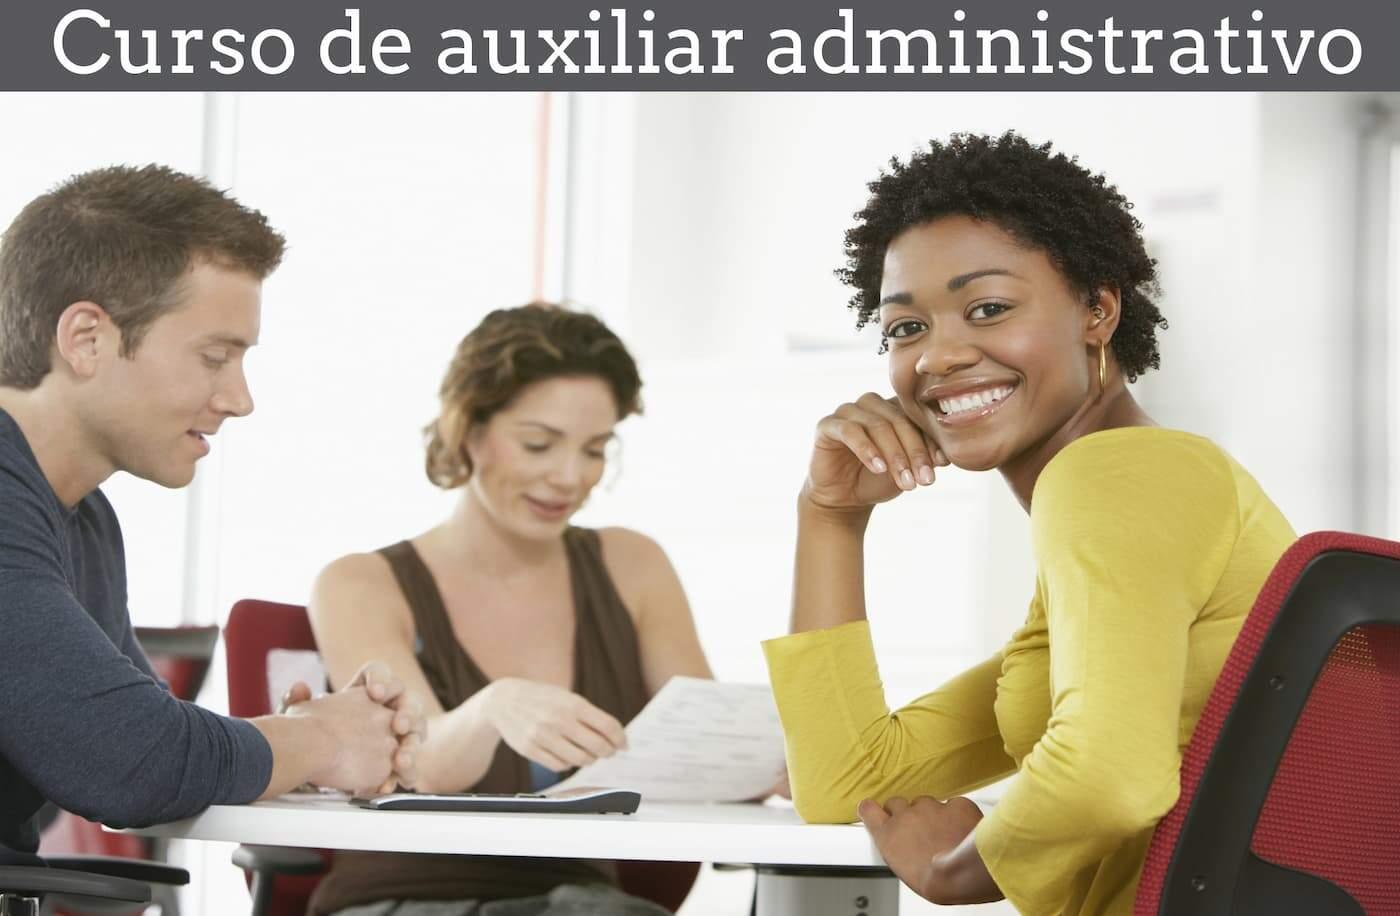 Curso de auxiliar administrativo online gratuito